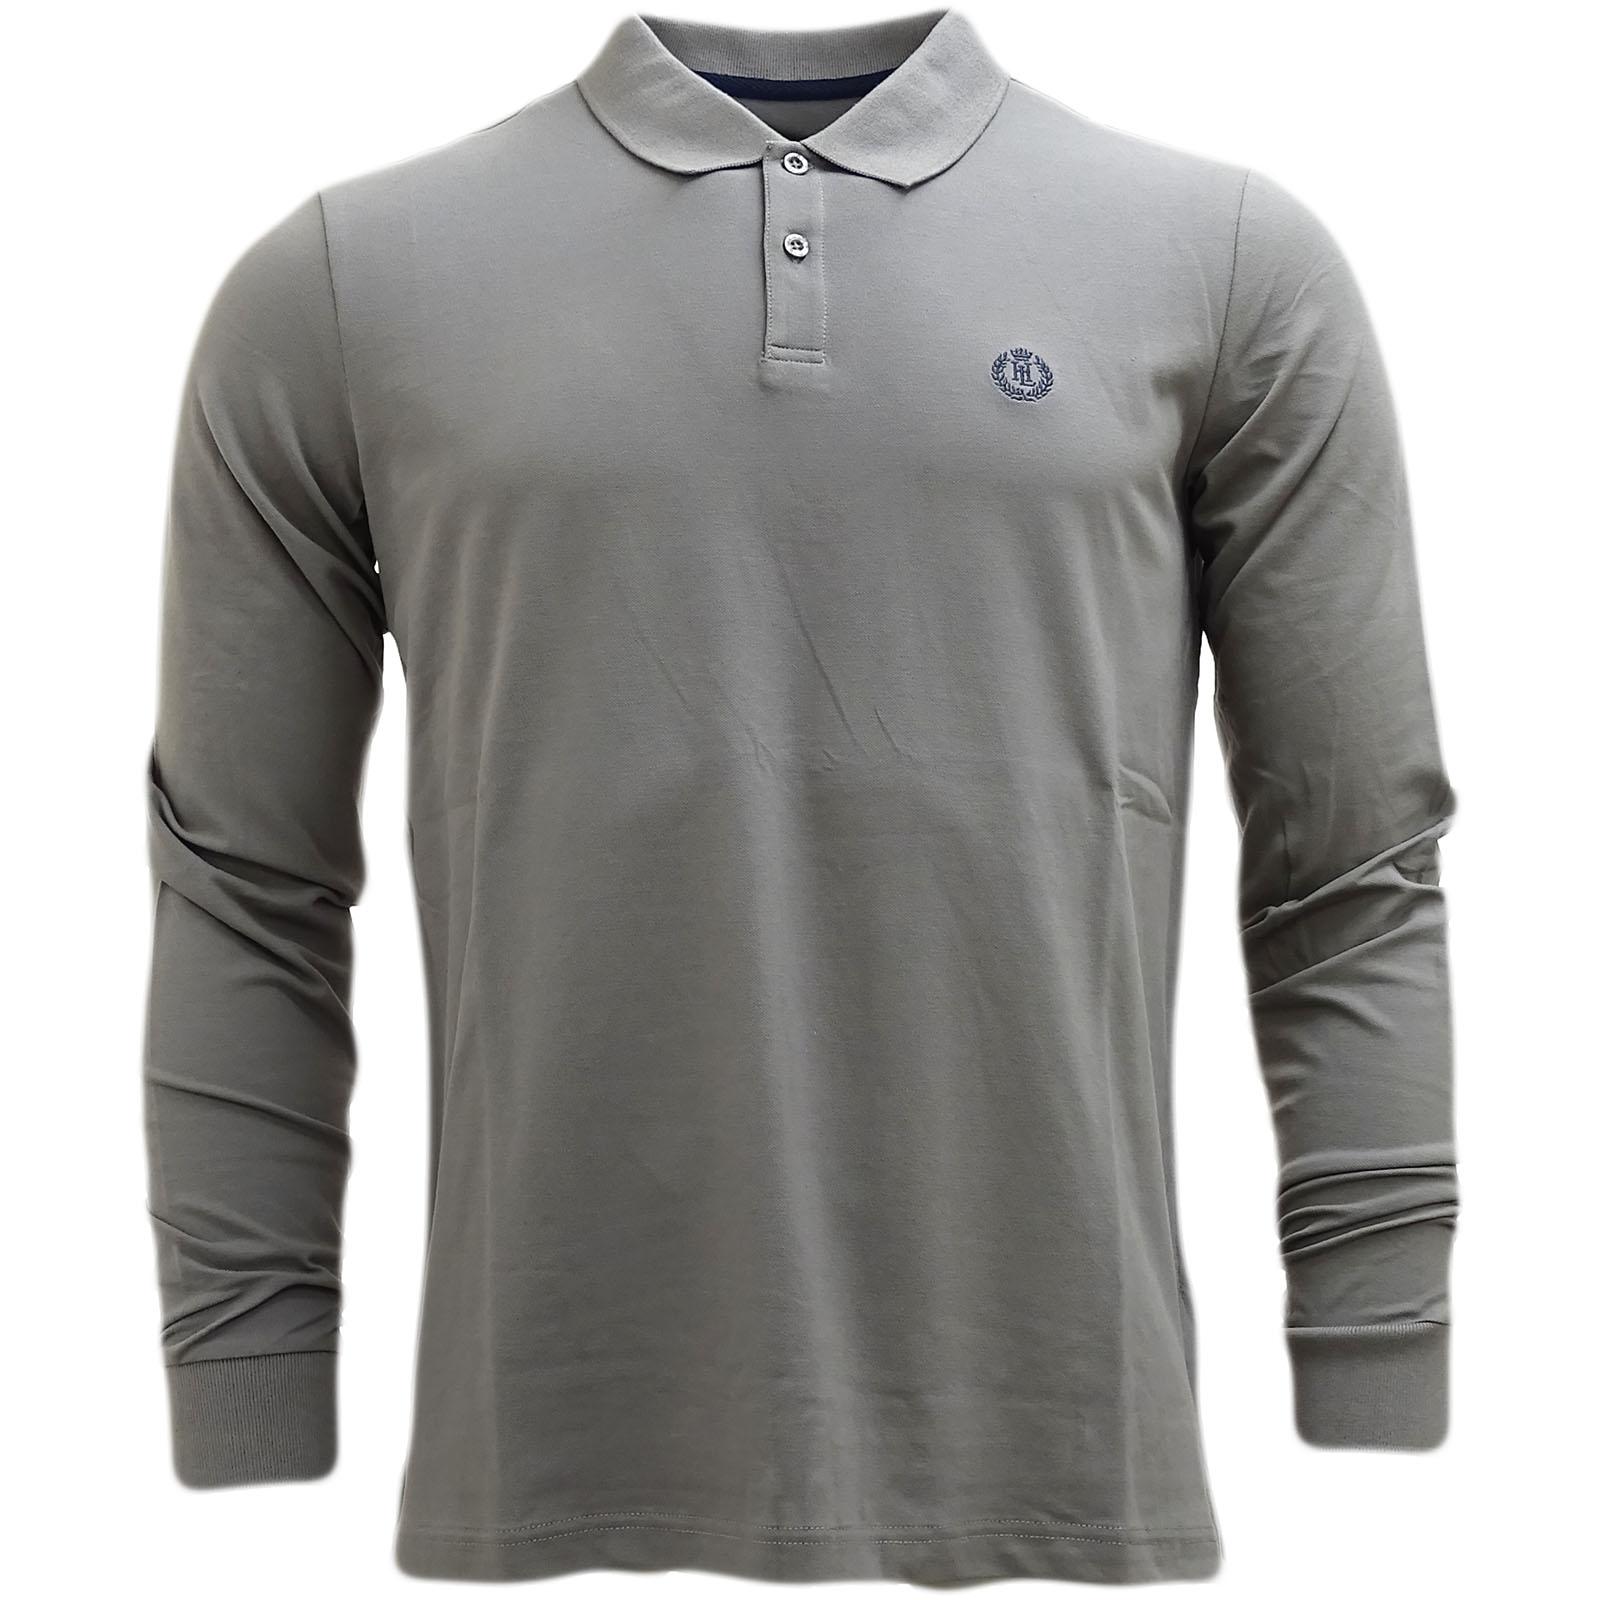 035f2ba1959 Sentinel Henri Lloyd Plain Lightweight Long Sleeve Polo Shirt - Musburry